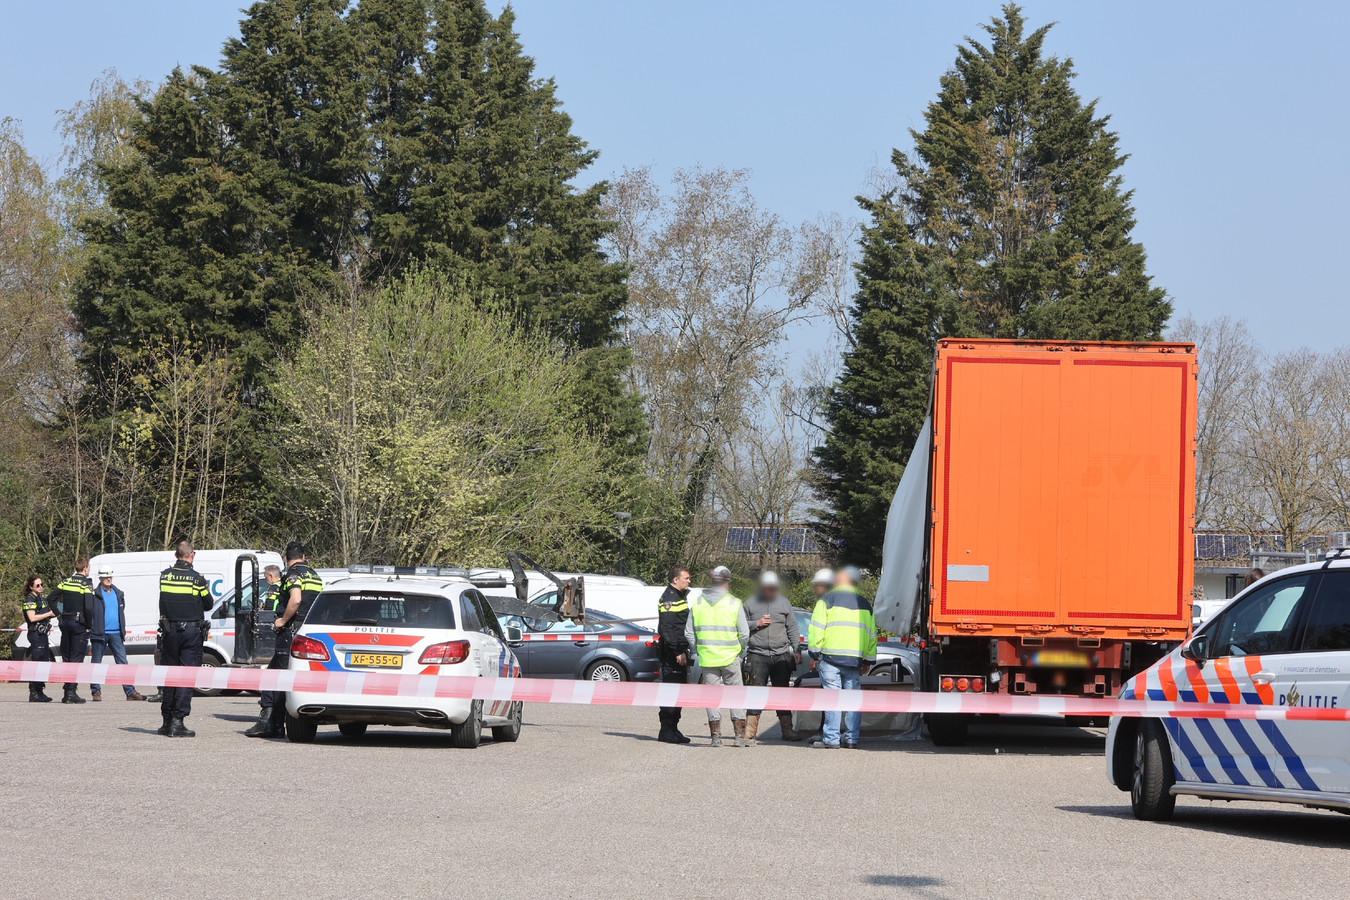 Ongeluk in Nuland, vrachtwagenchauffeur zwaar gewond